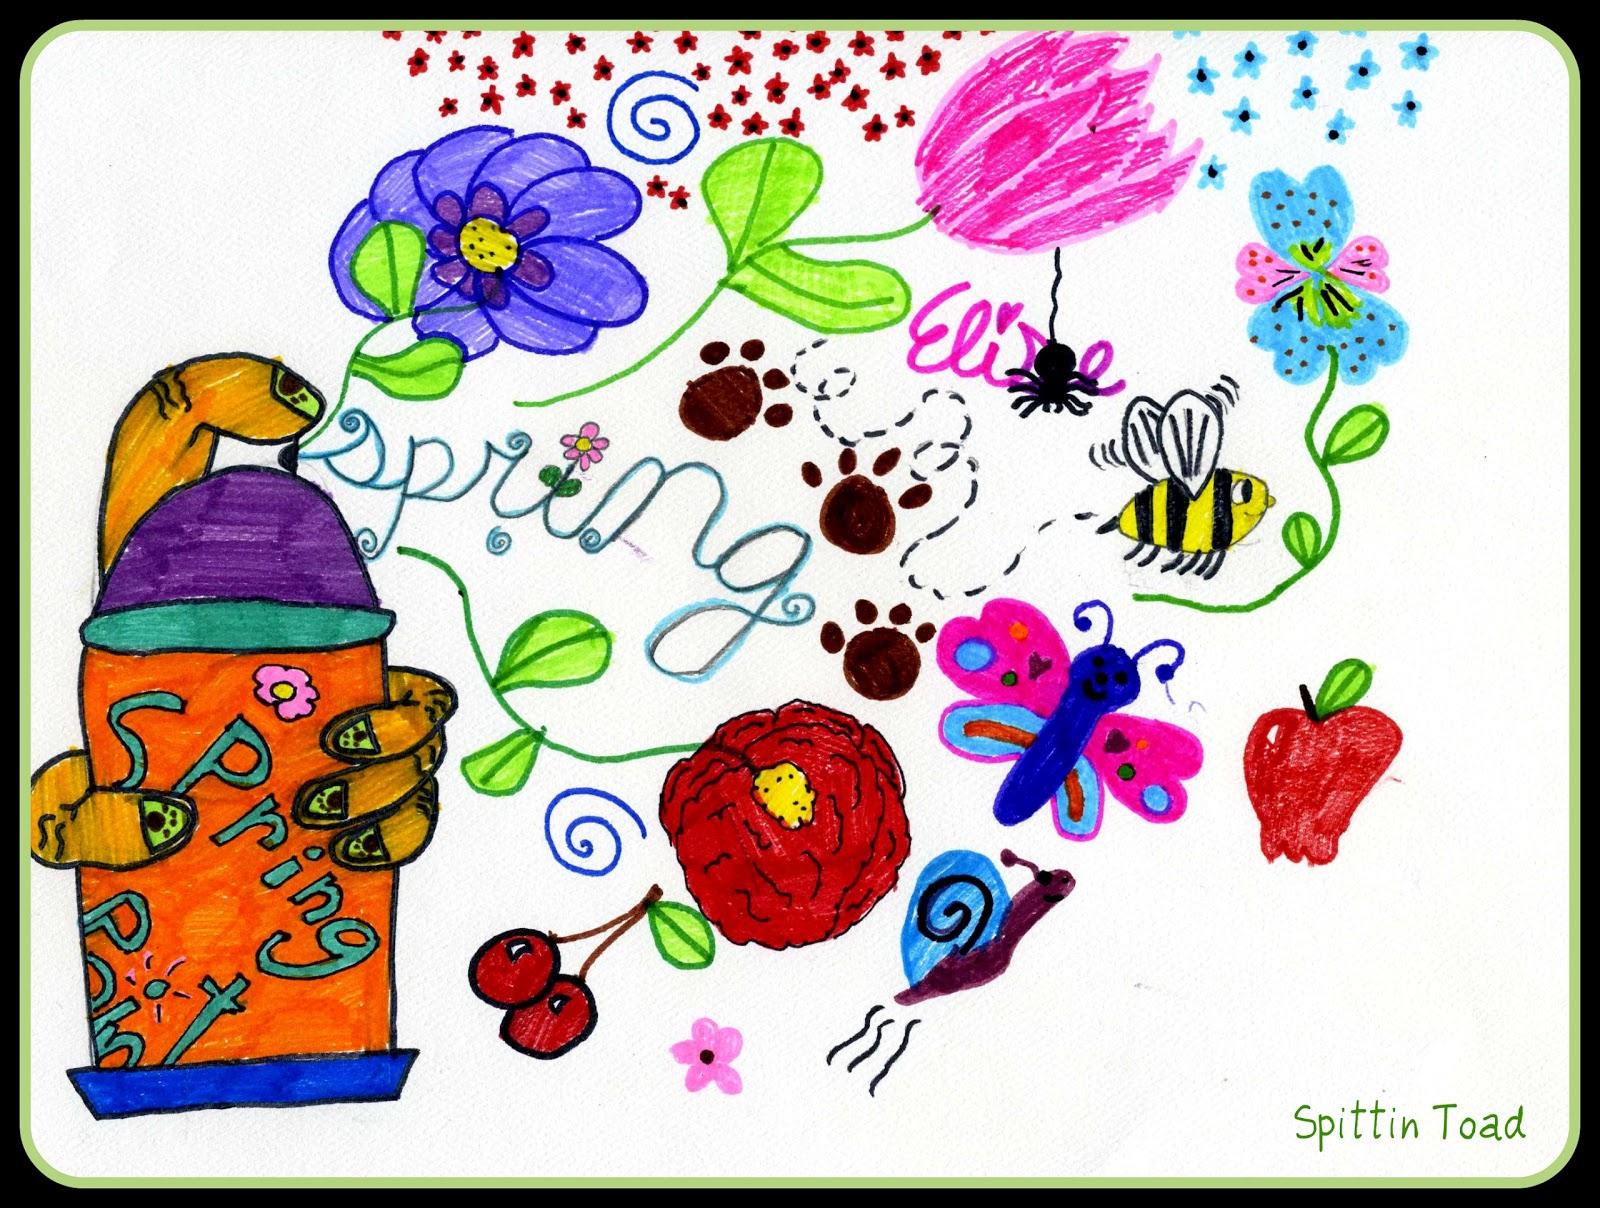 spittin toad kids art spray painting spring. Black Bedroom Furniture Sets. Home Design Ideas